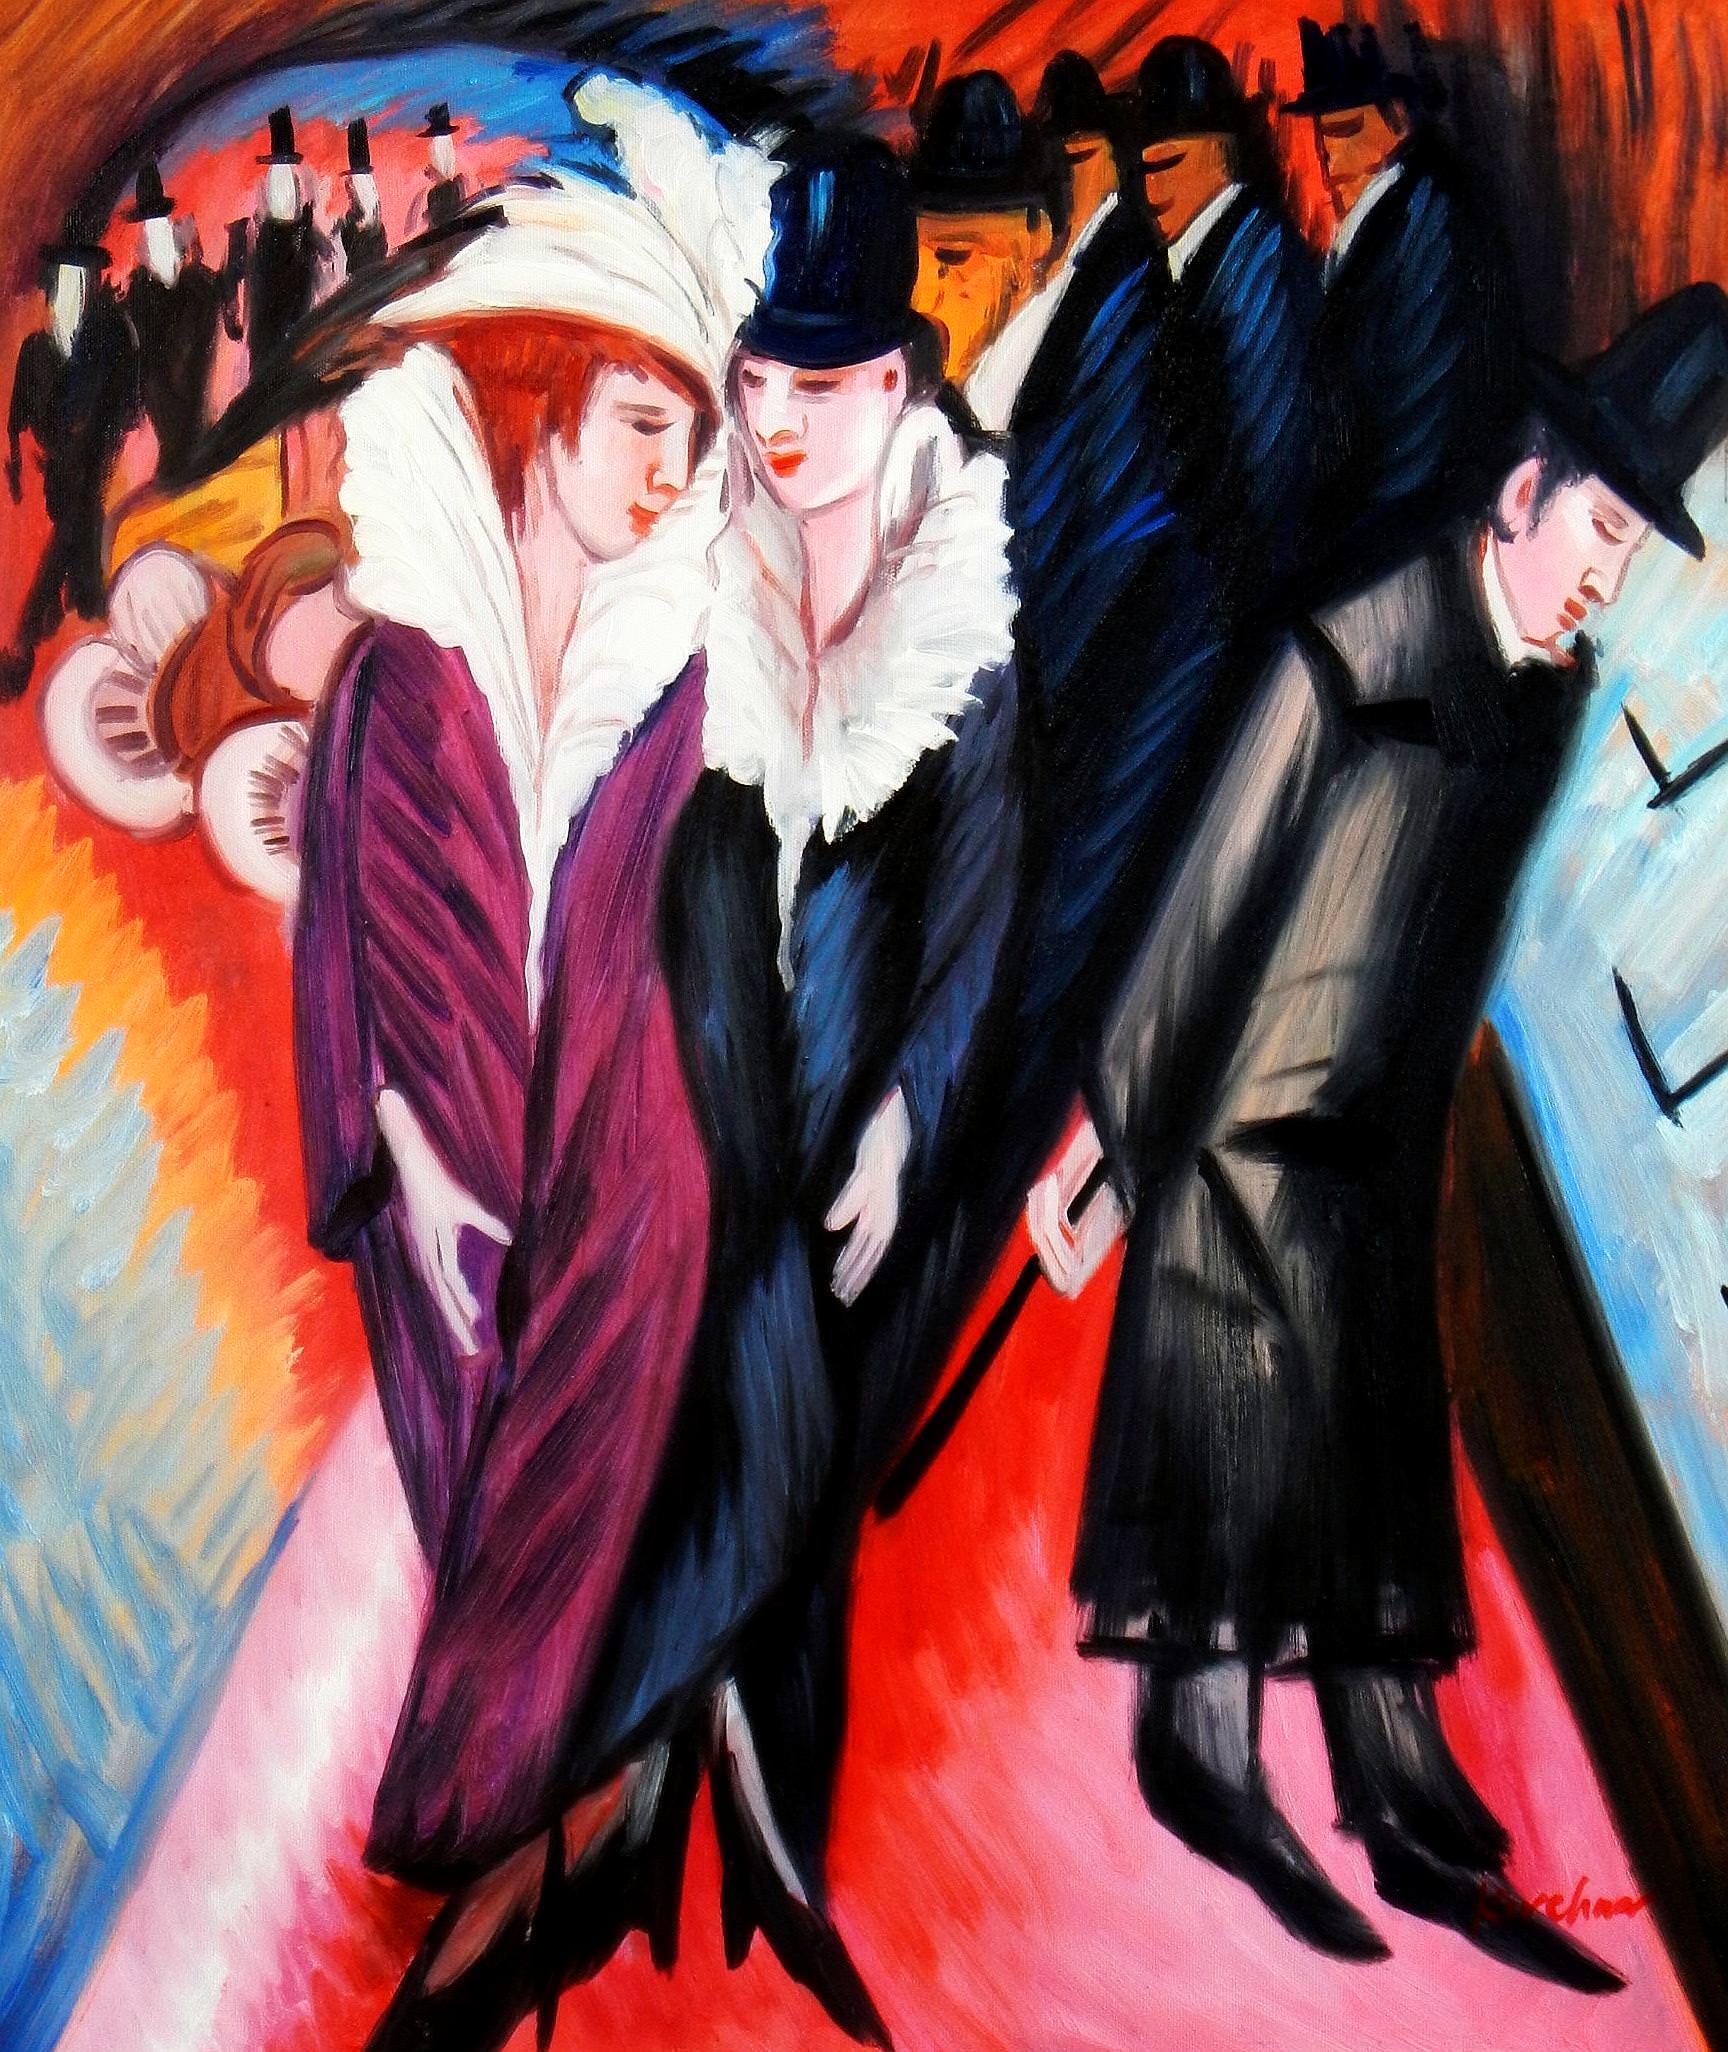 Ernst Ludwig Kirchner - Straßenszene Berlin c93656 50x60cm exquisites Ölbild